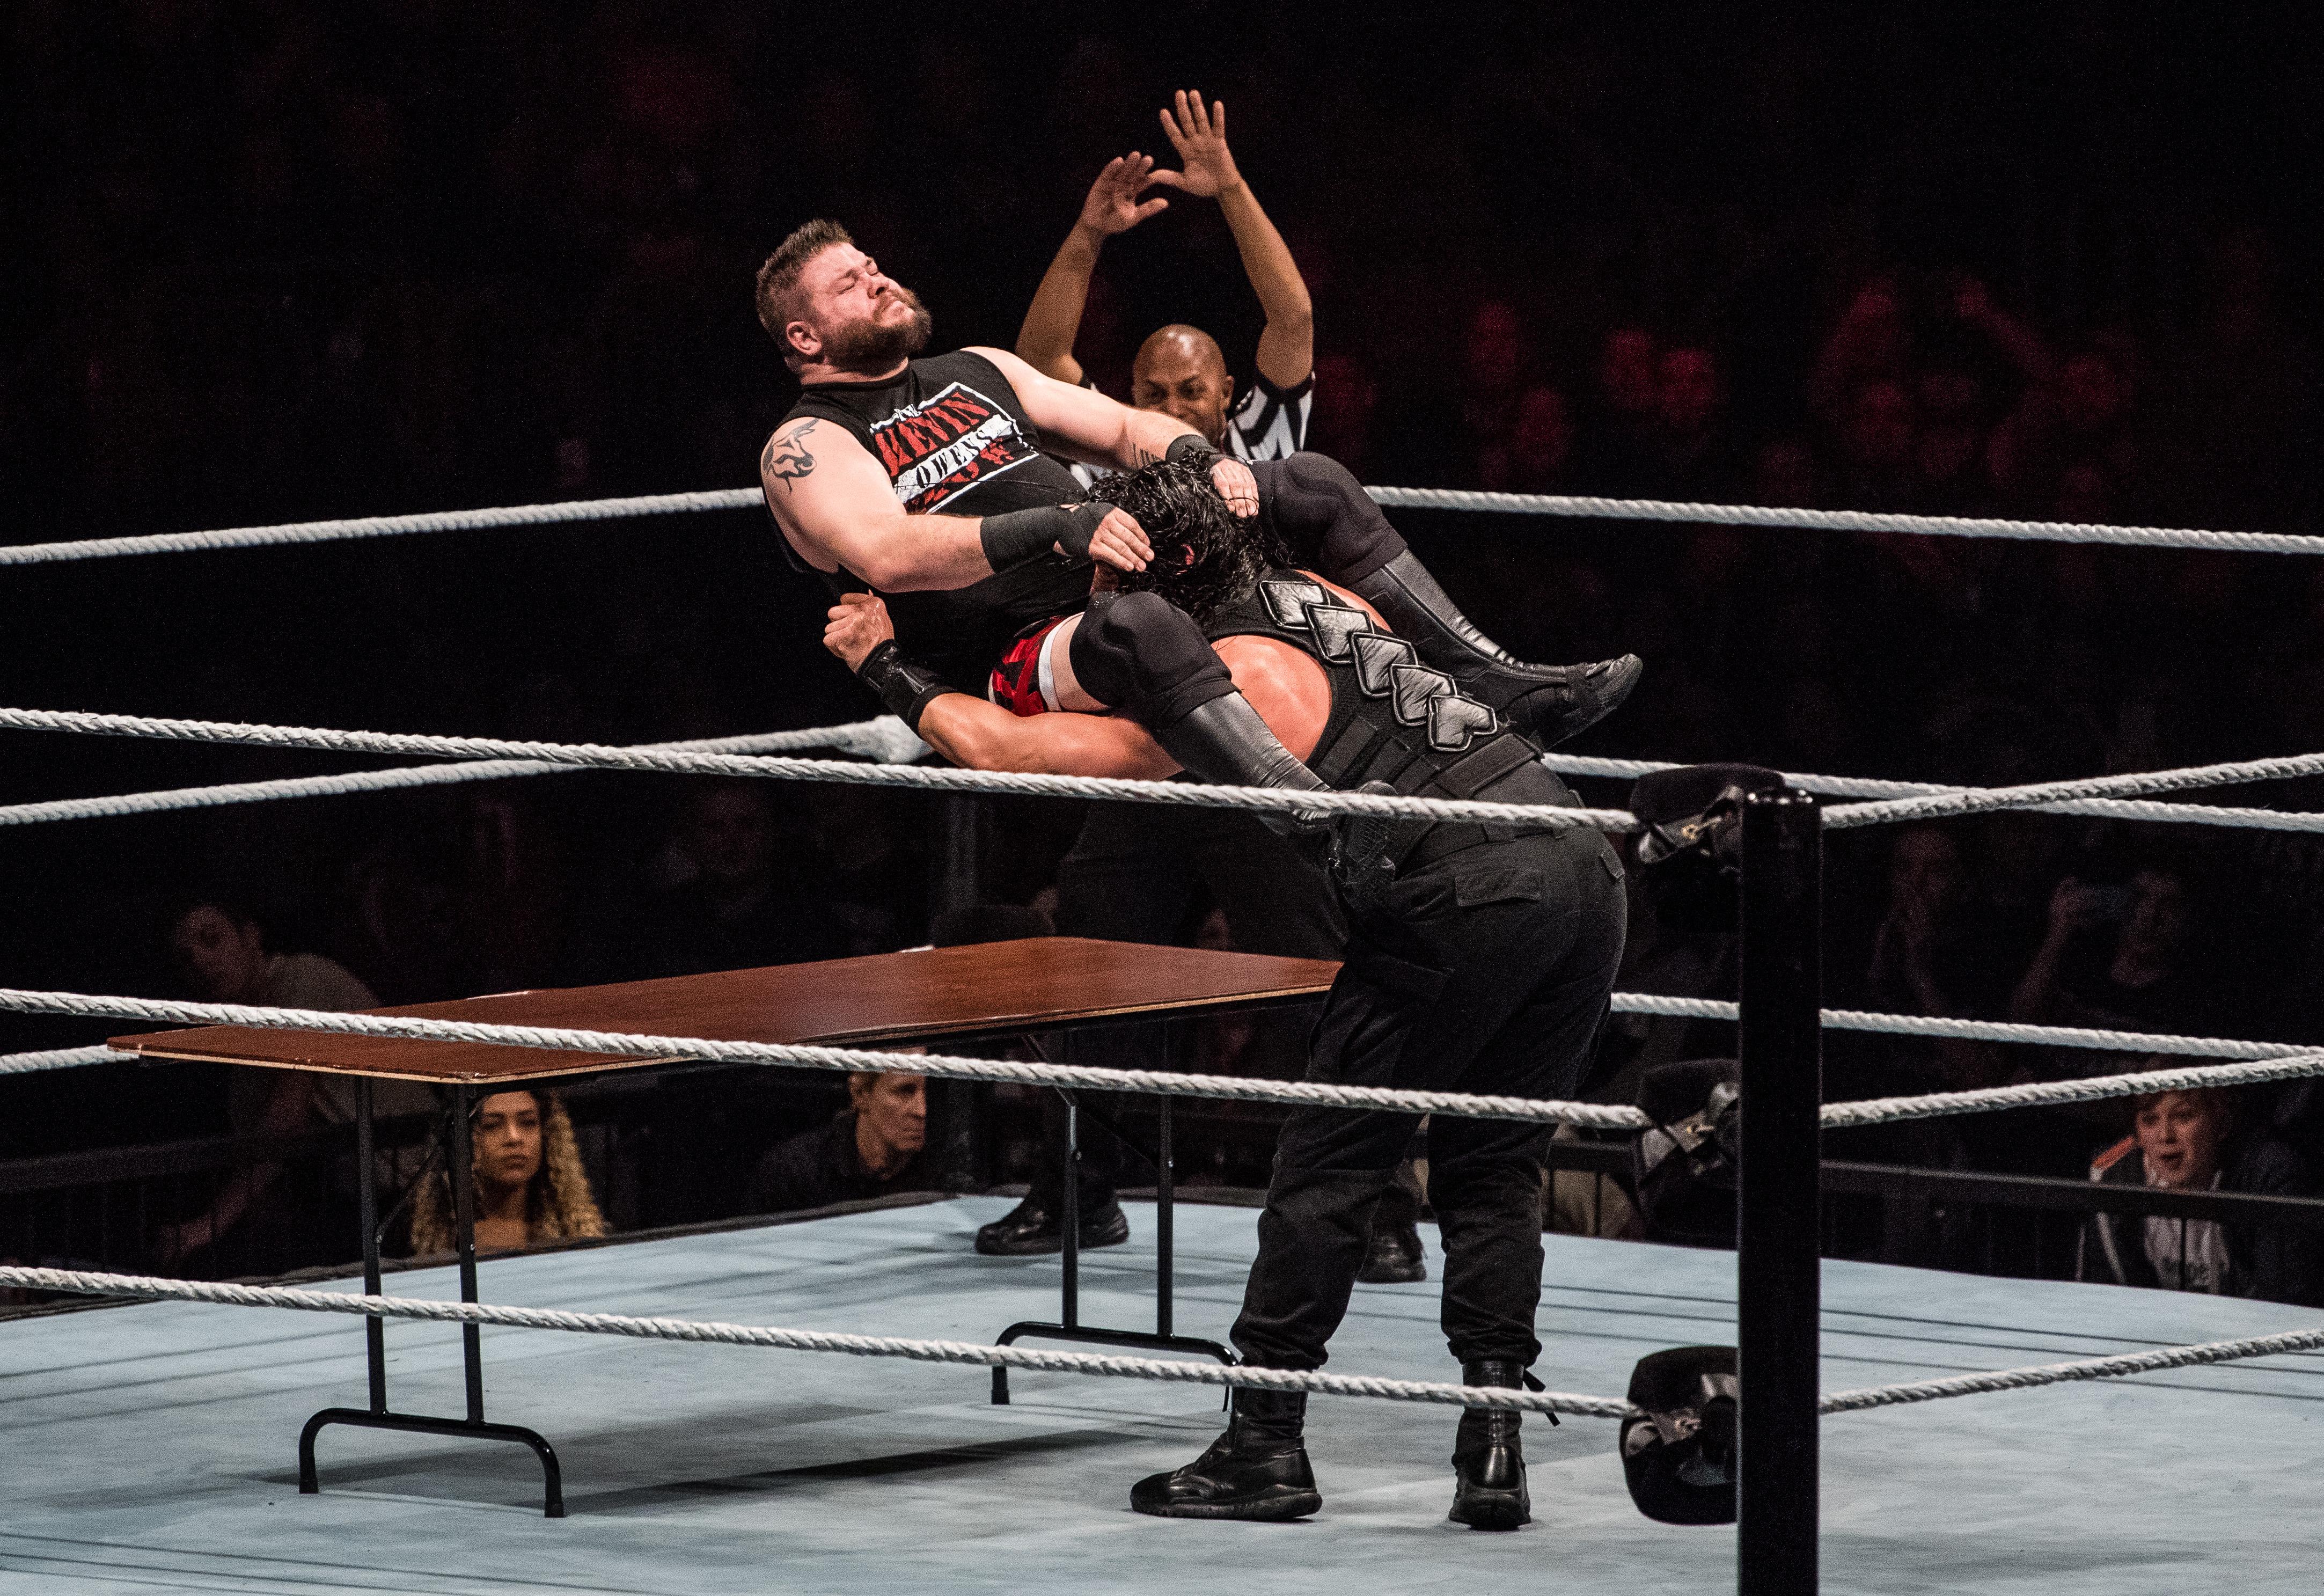 Kevin Owens vs Chris Jericho